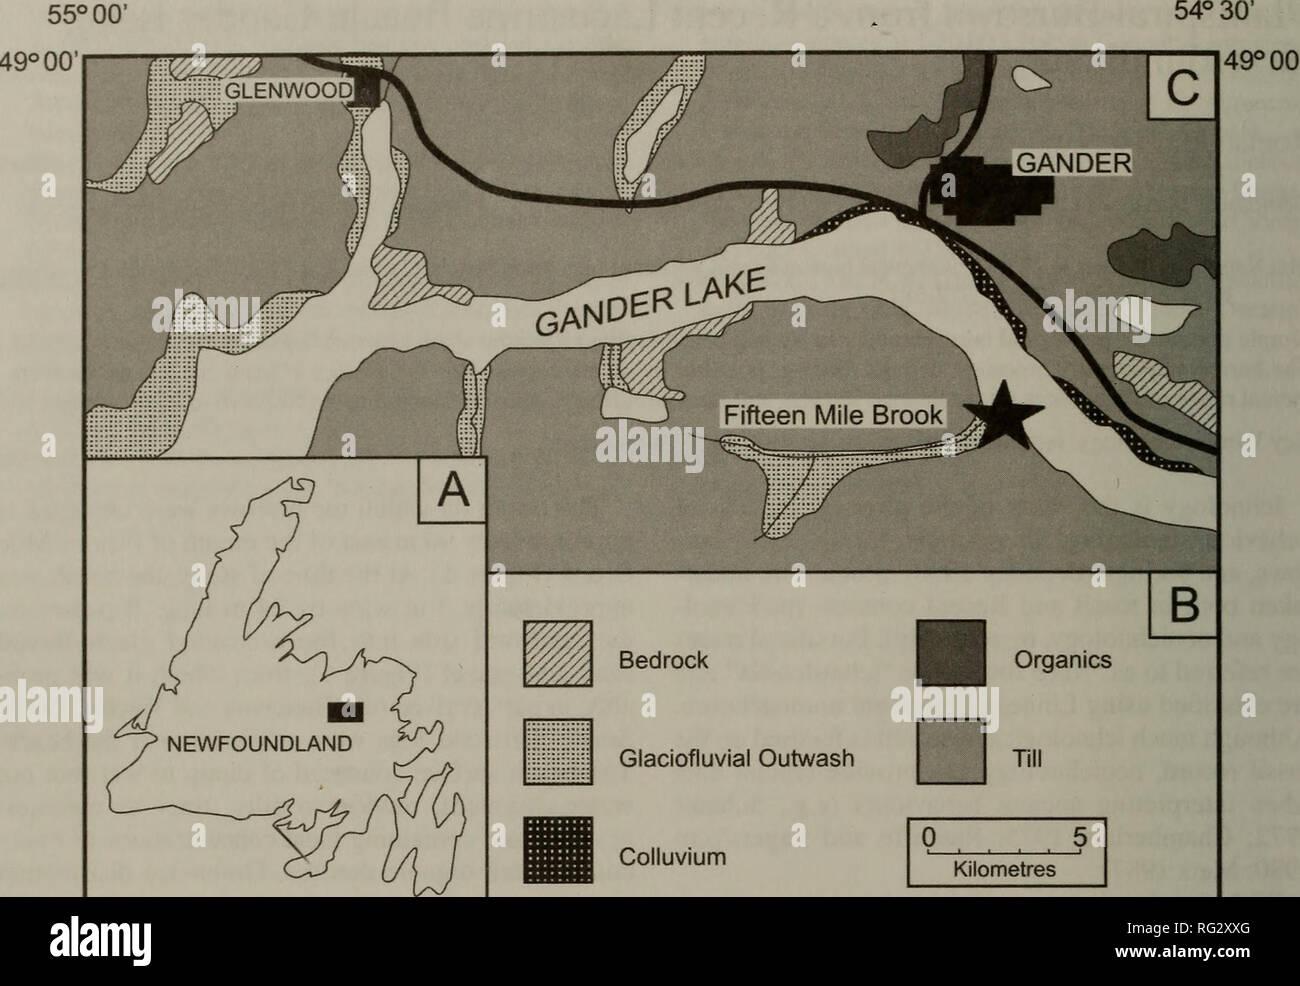 Gander Canada Map.Gander Newfoundland Stock Photos Gander Newfoundland Stock Images